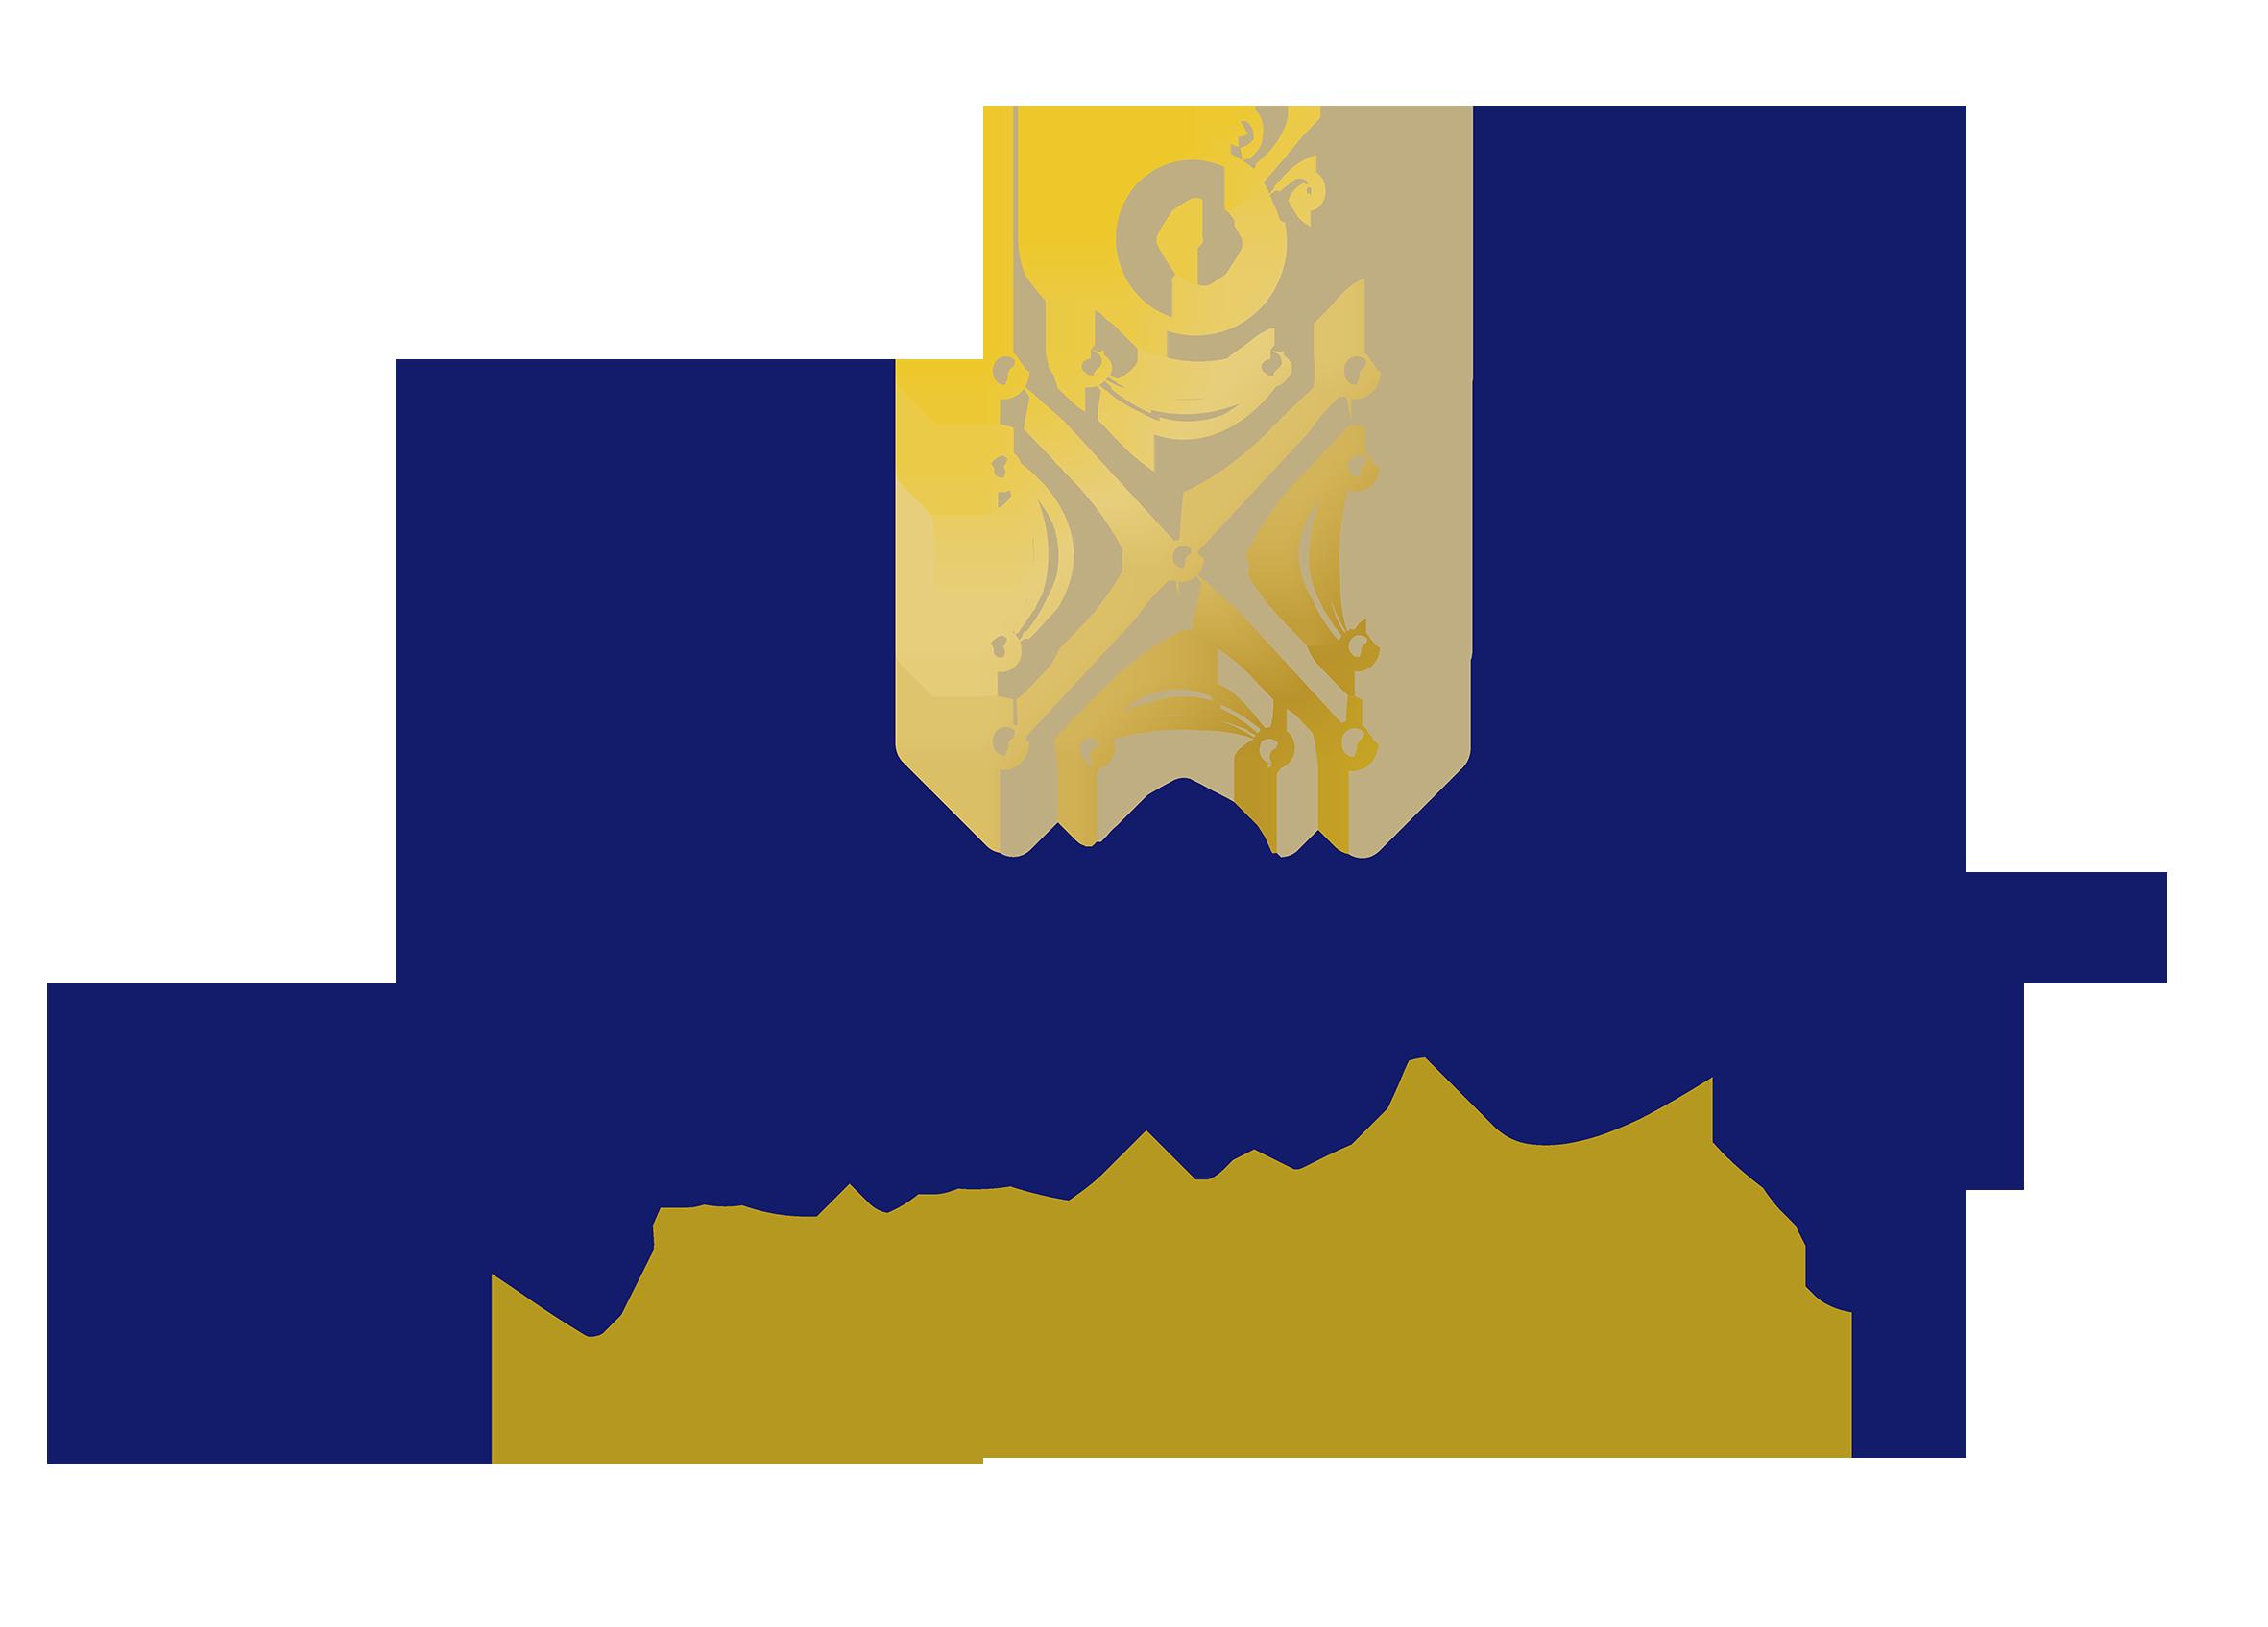 Audrey Jade